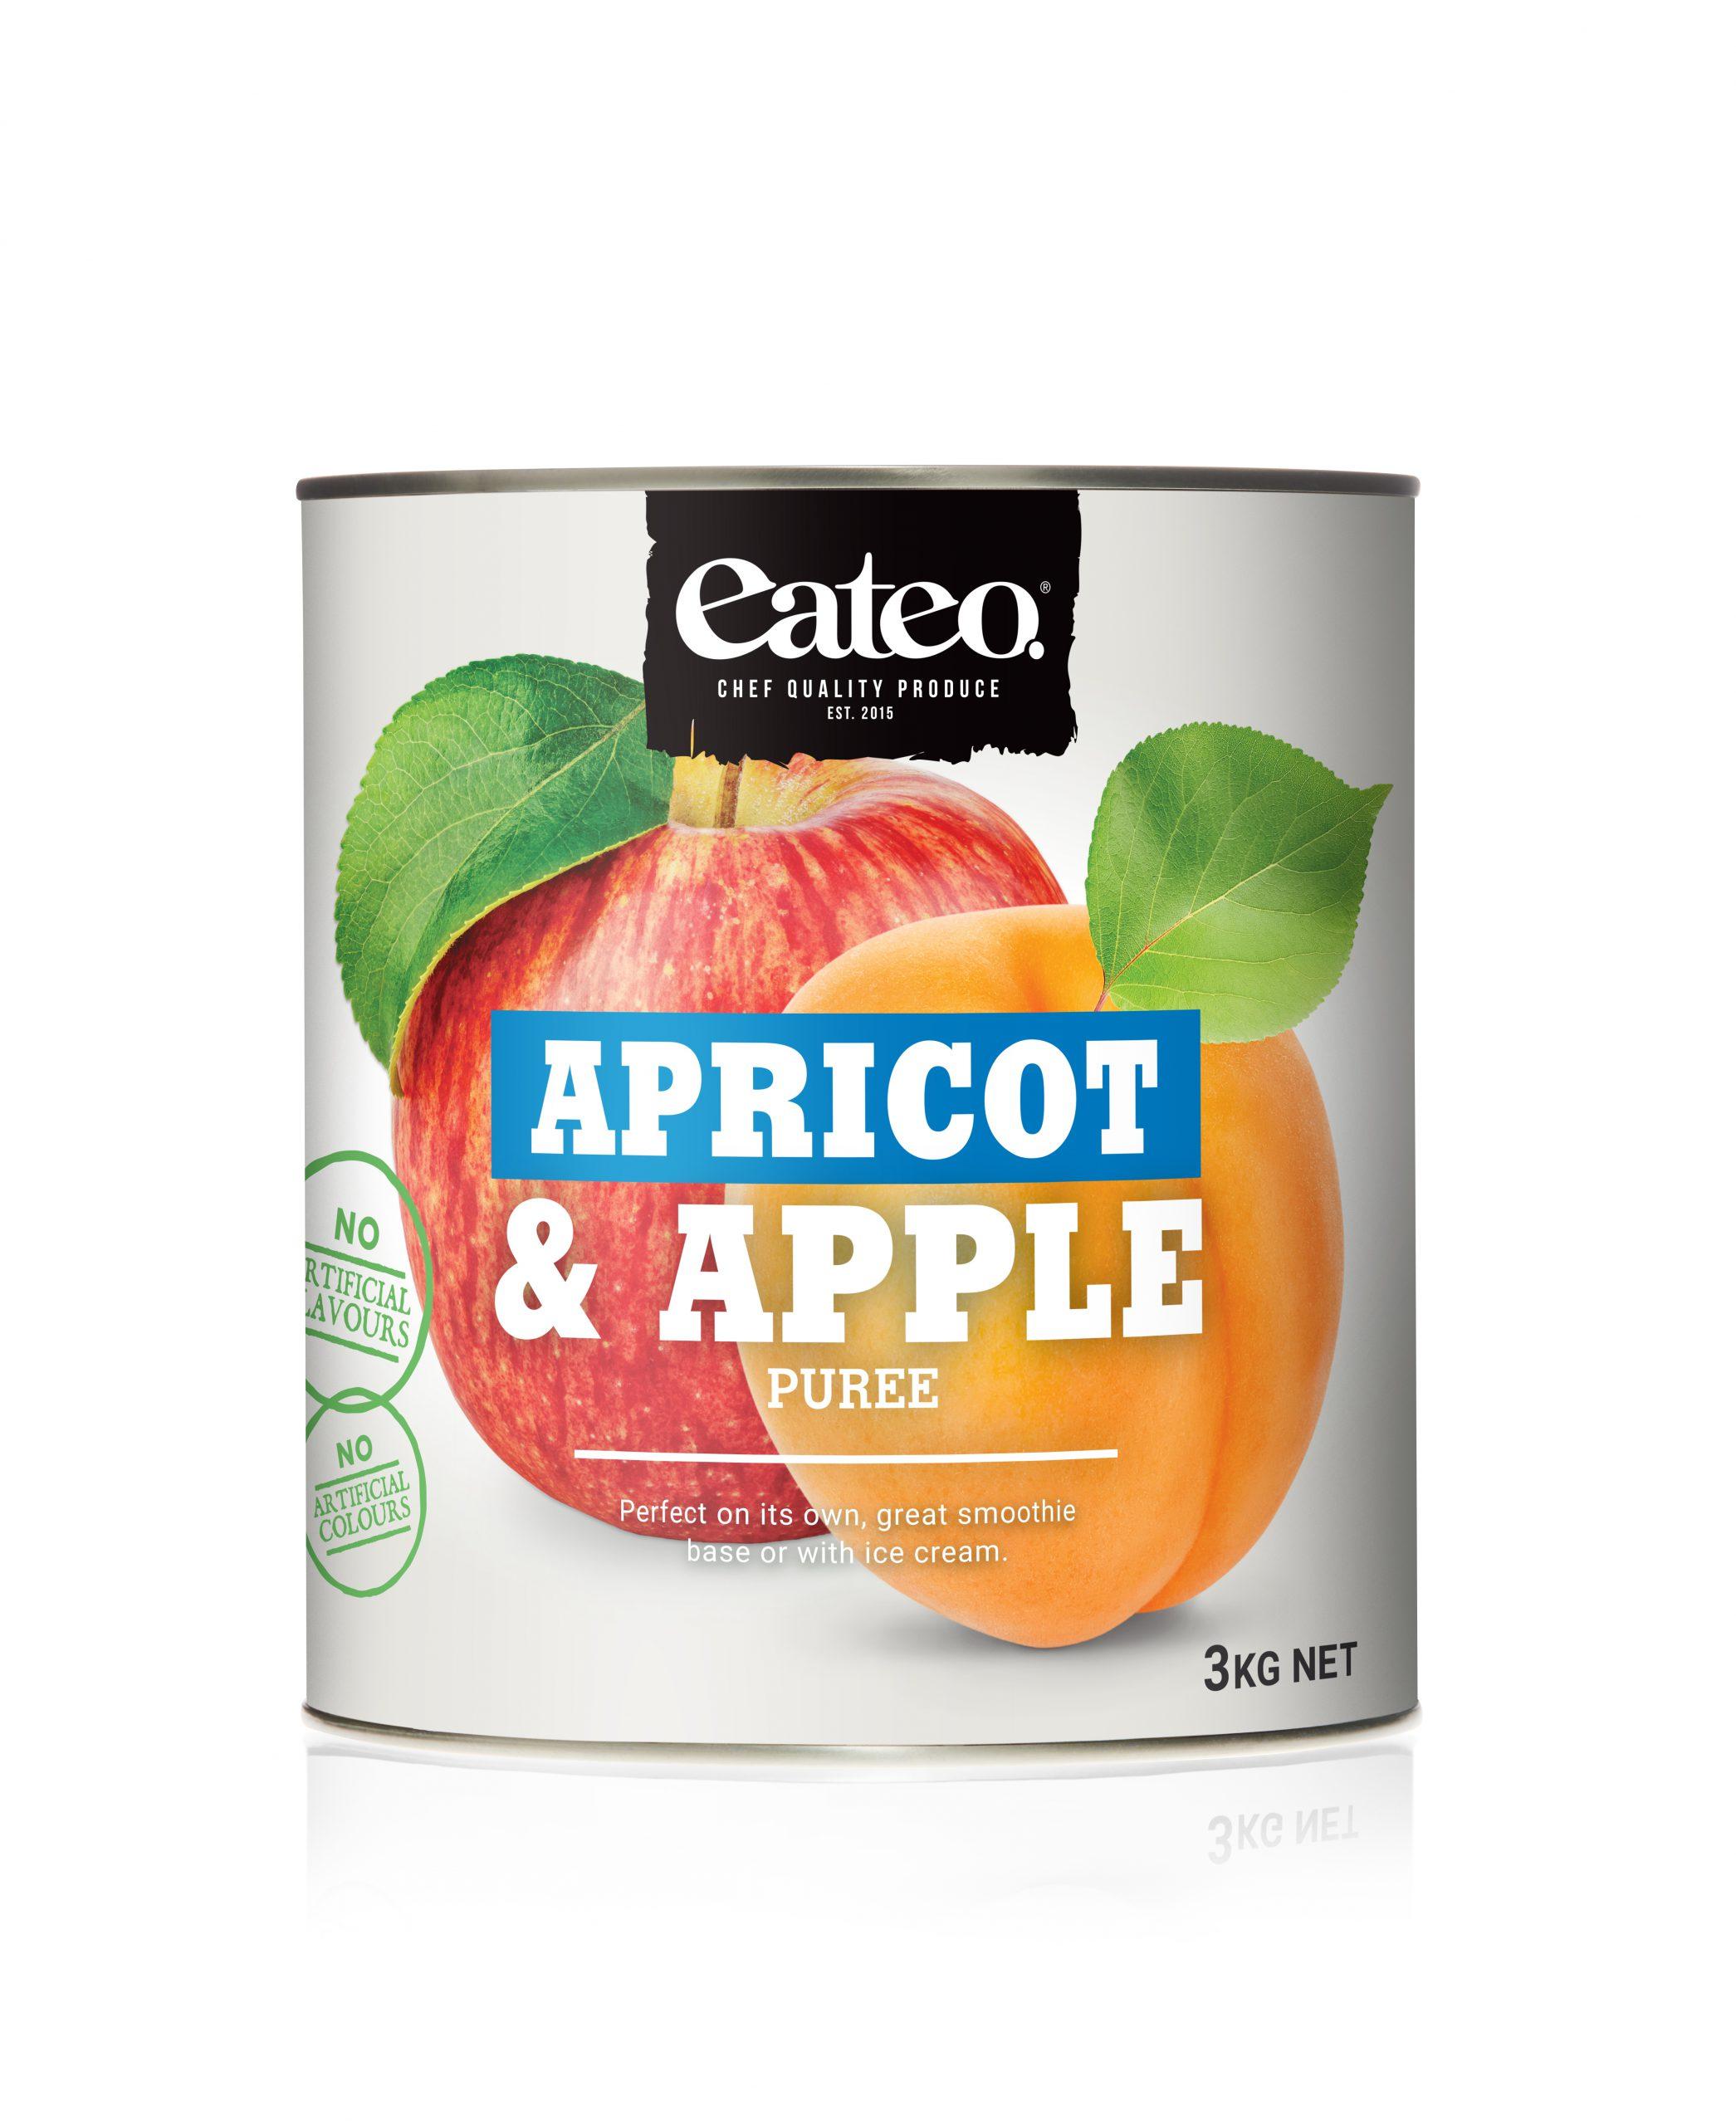 Apricot & Apple Puree